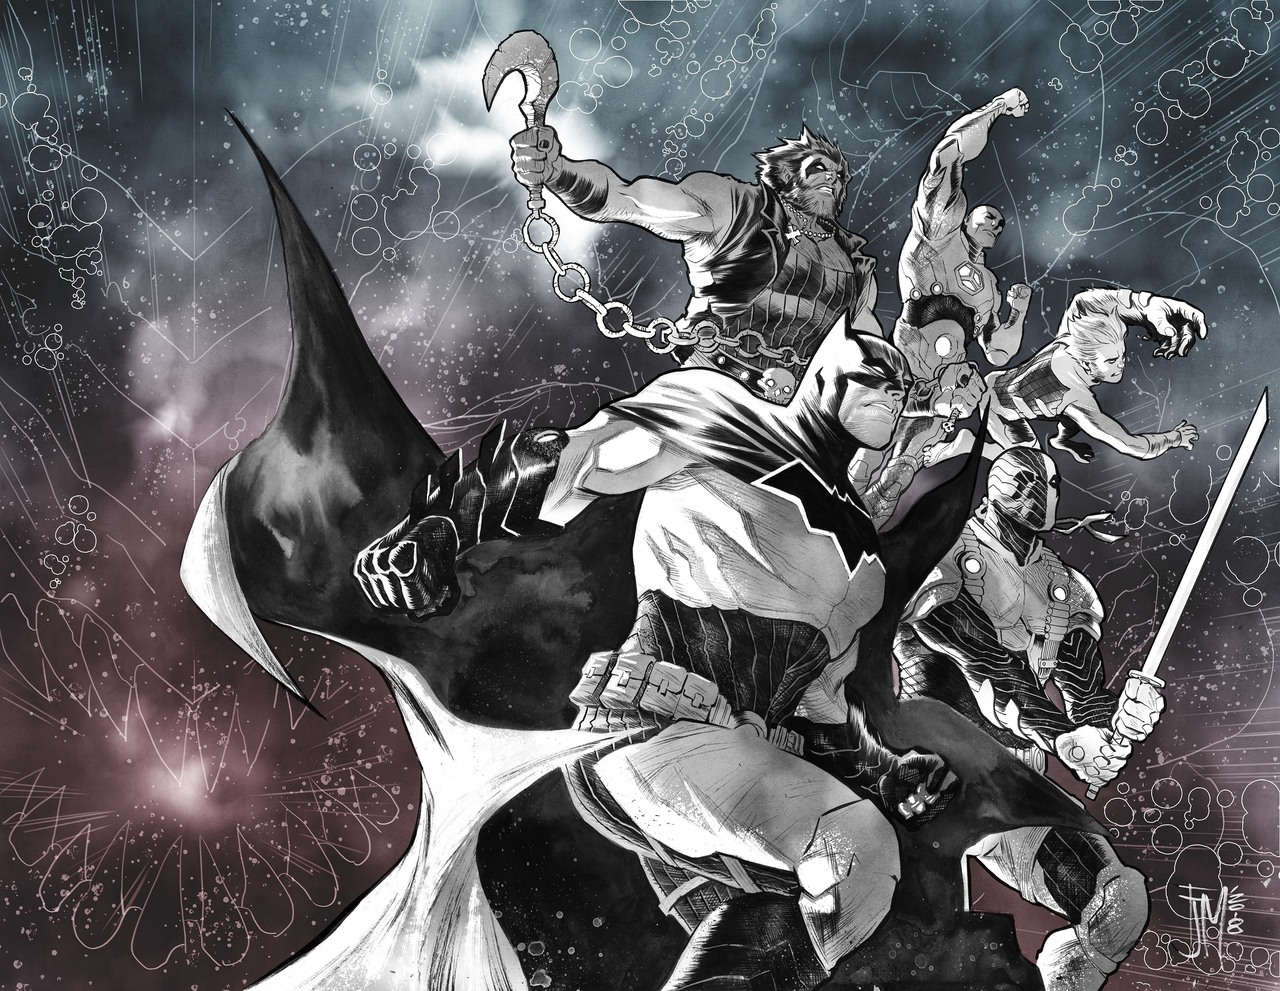 Justice League: No Justice #2 avec la team Entropy, cover par Francis Manapul